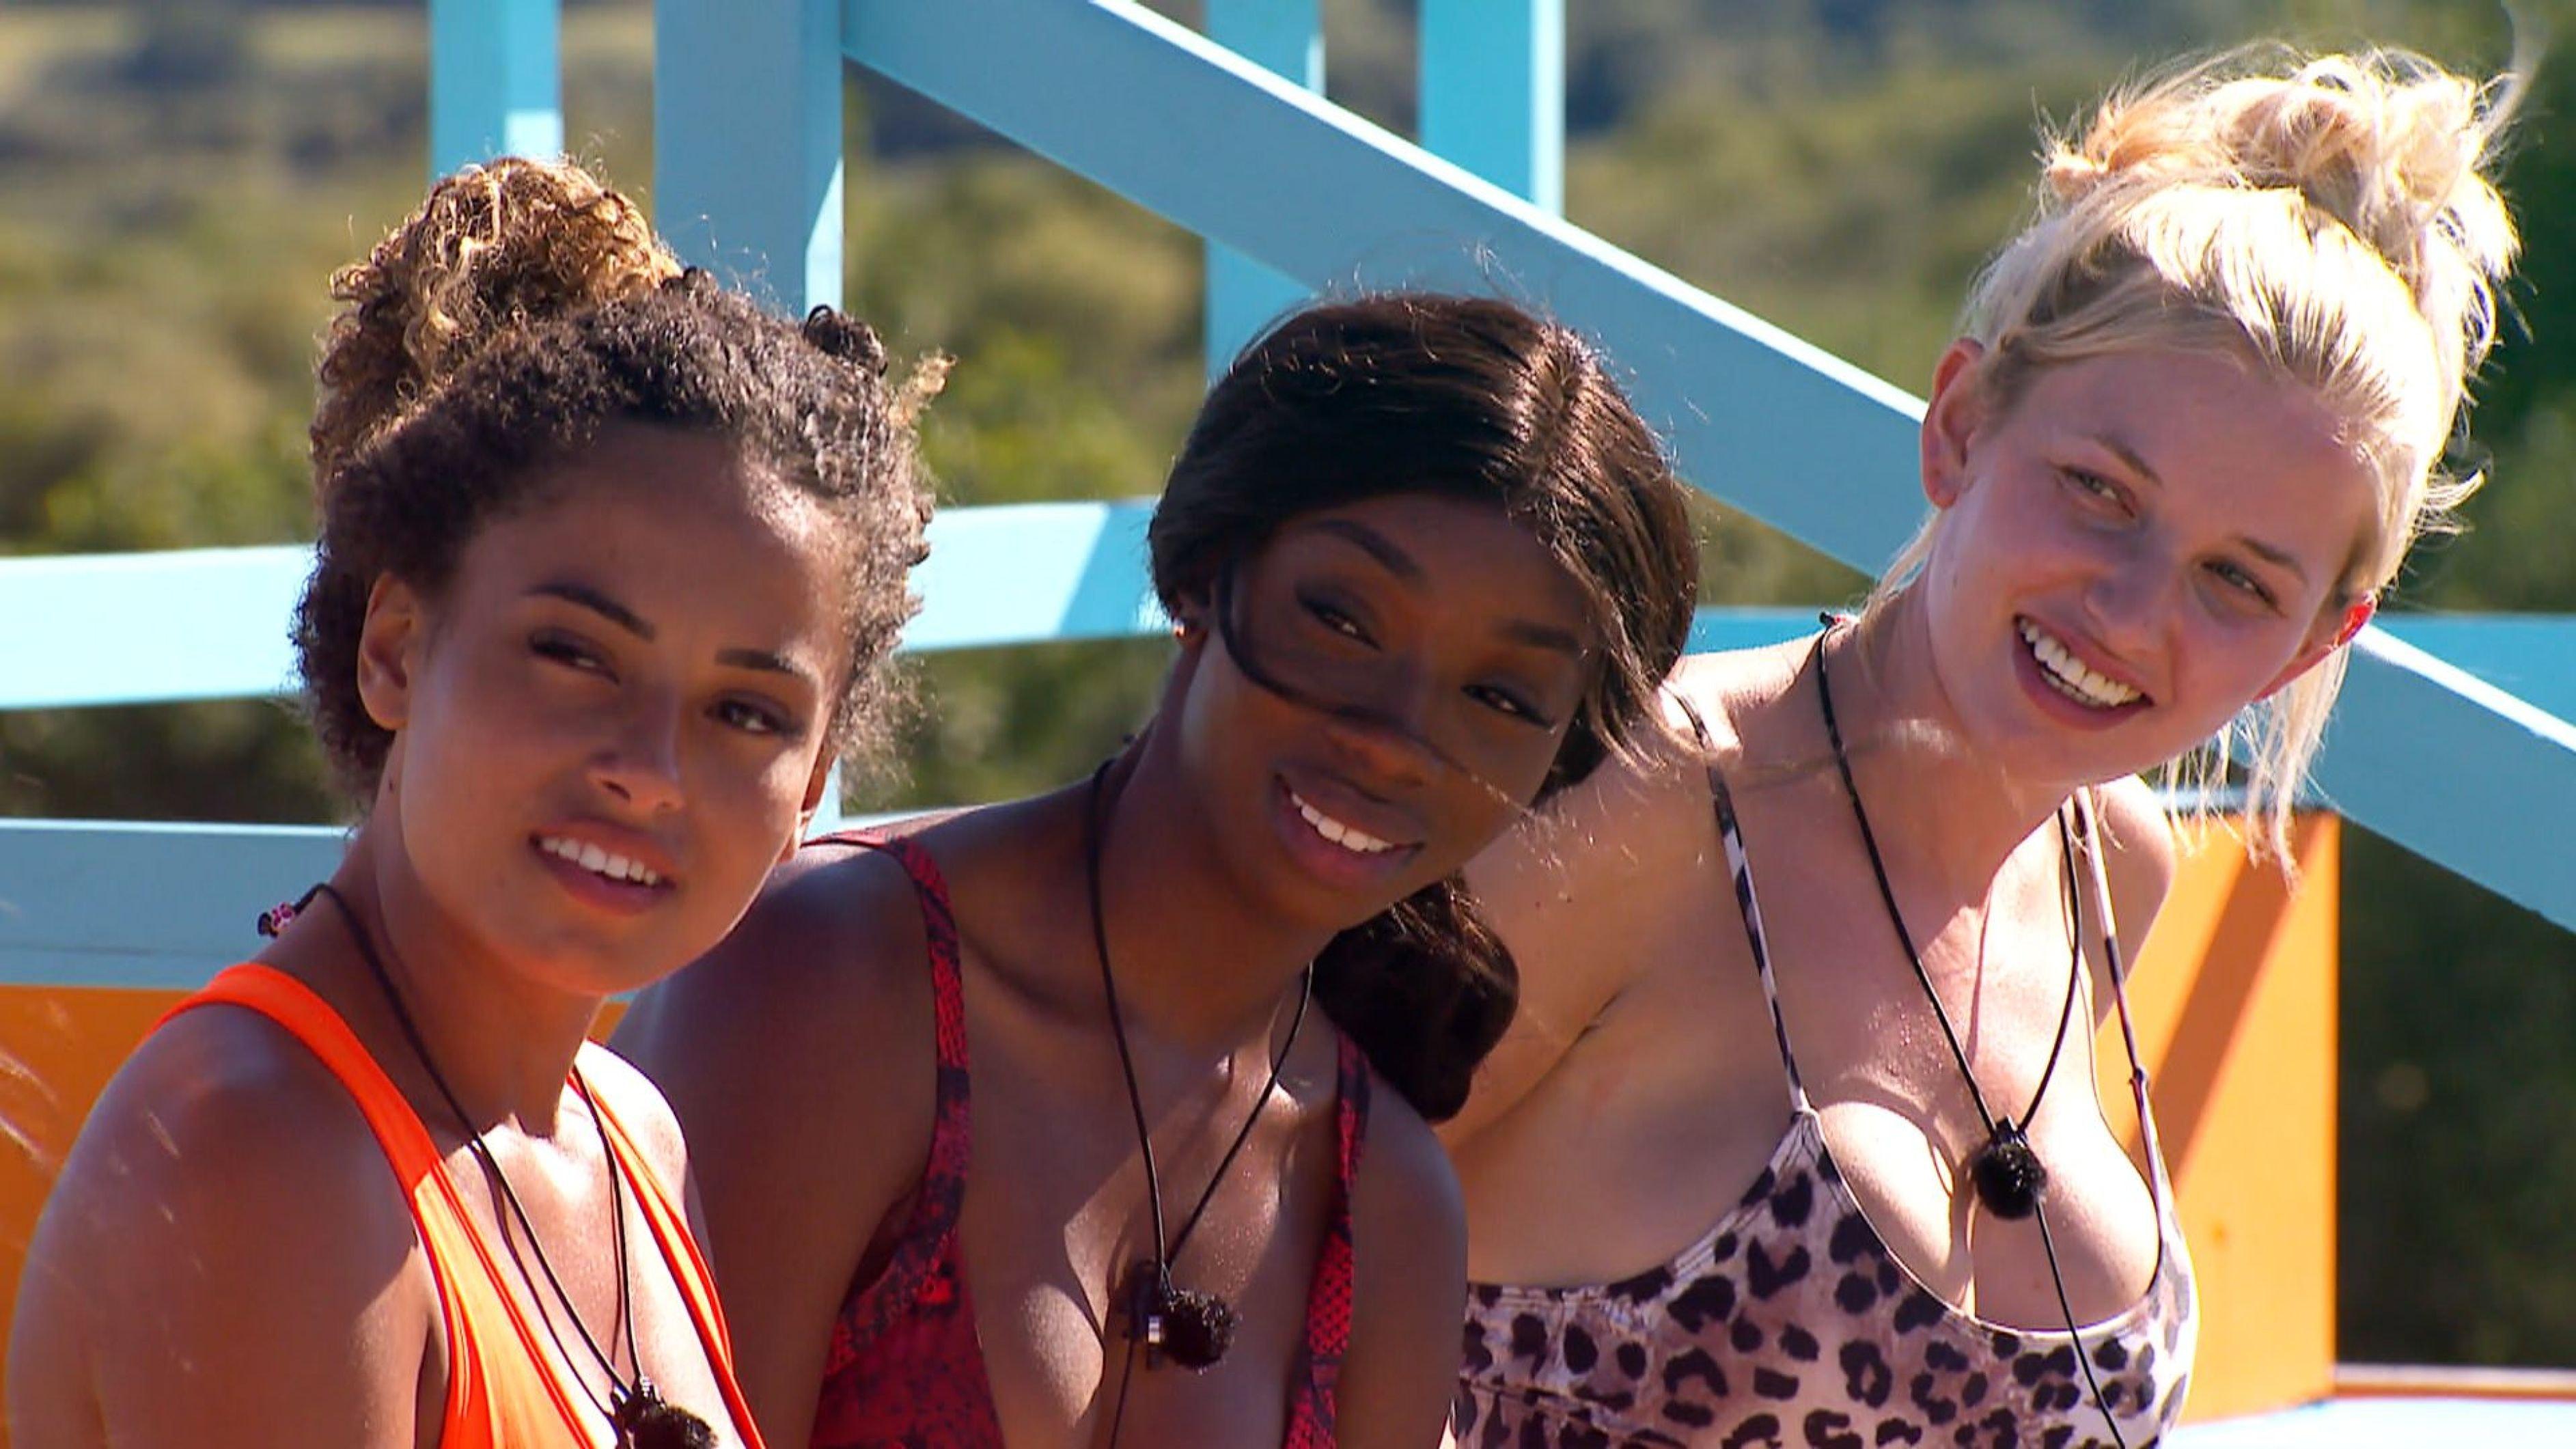 Do The 'Love Island' Contestants Get Beauty Treatments